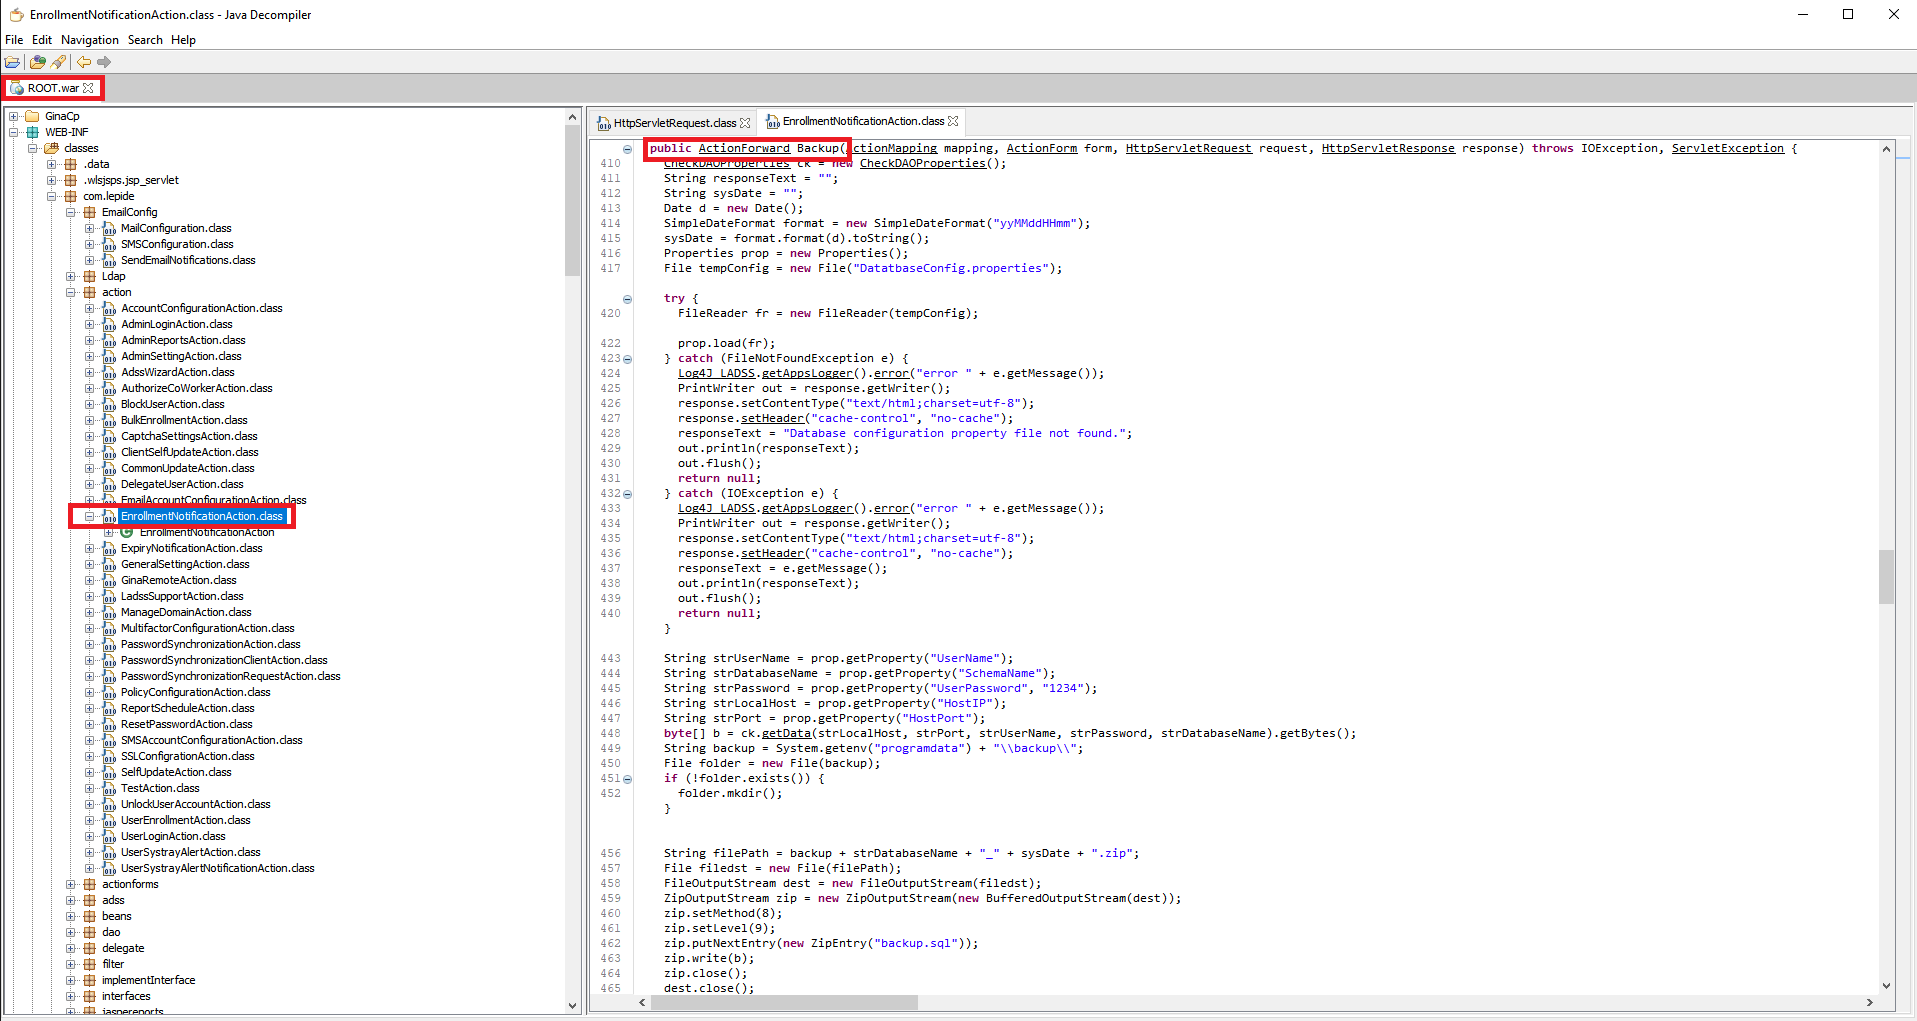 vuln_code_backup_marked